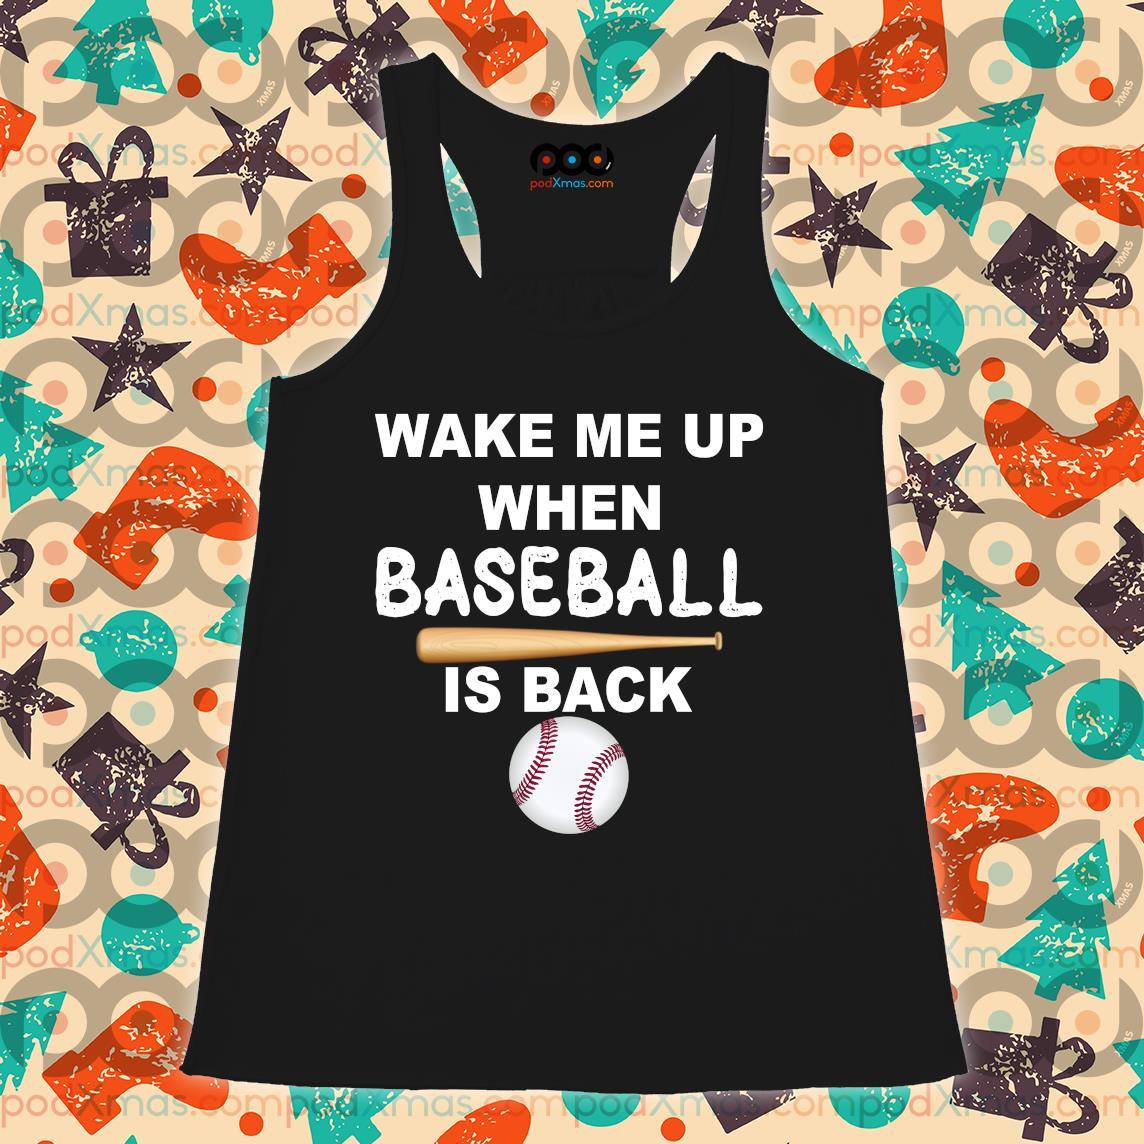 Wake me up when baseball is back s Flowy tank PODxmas den